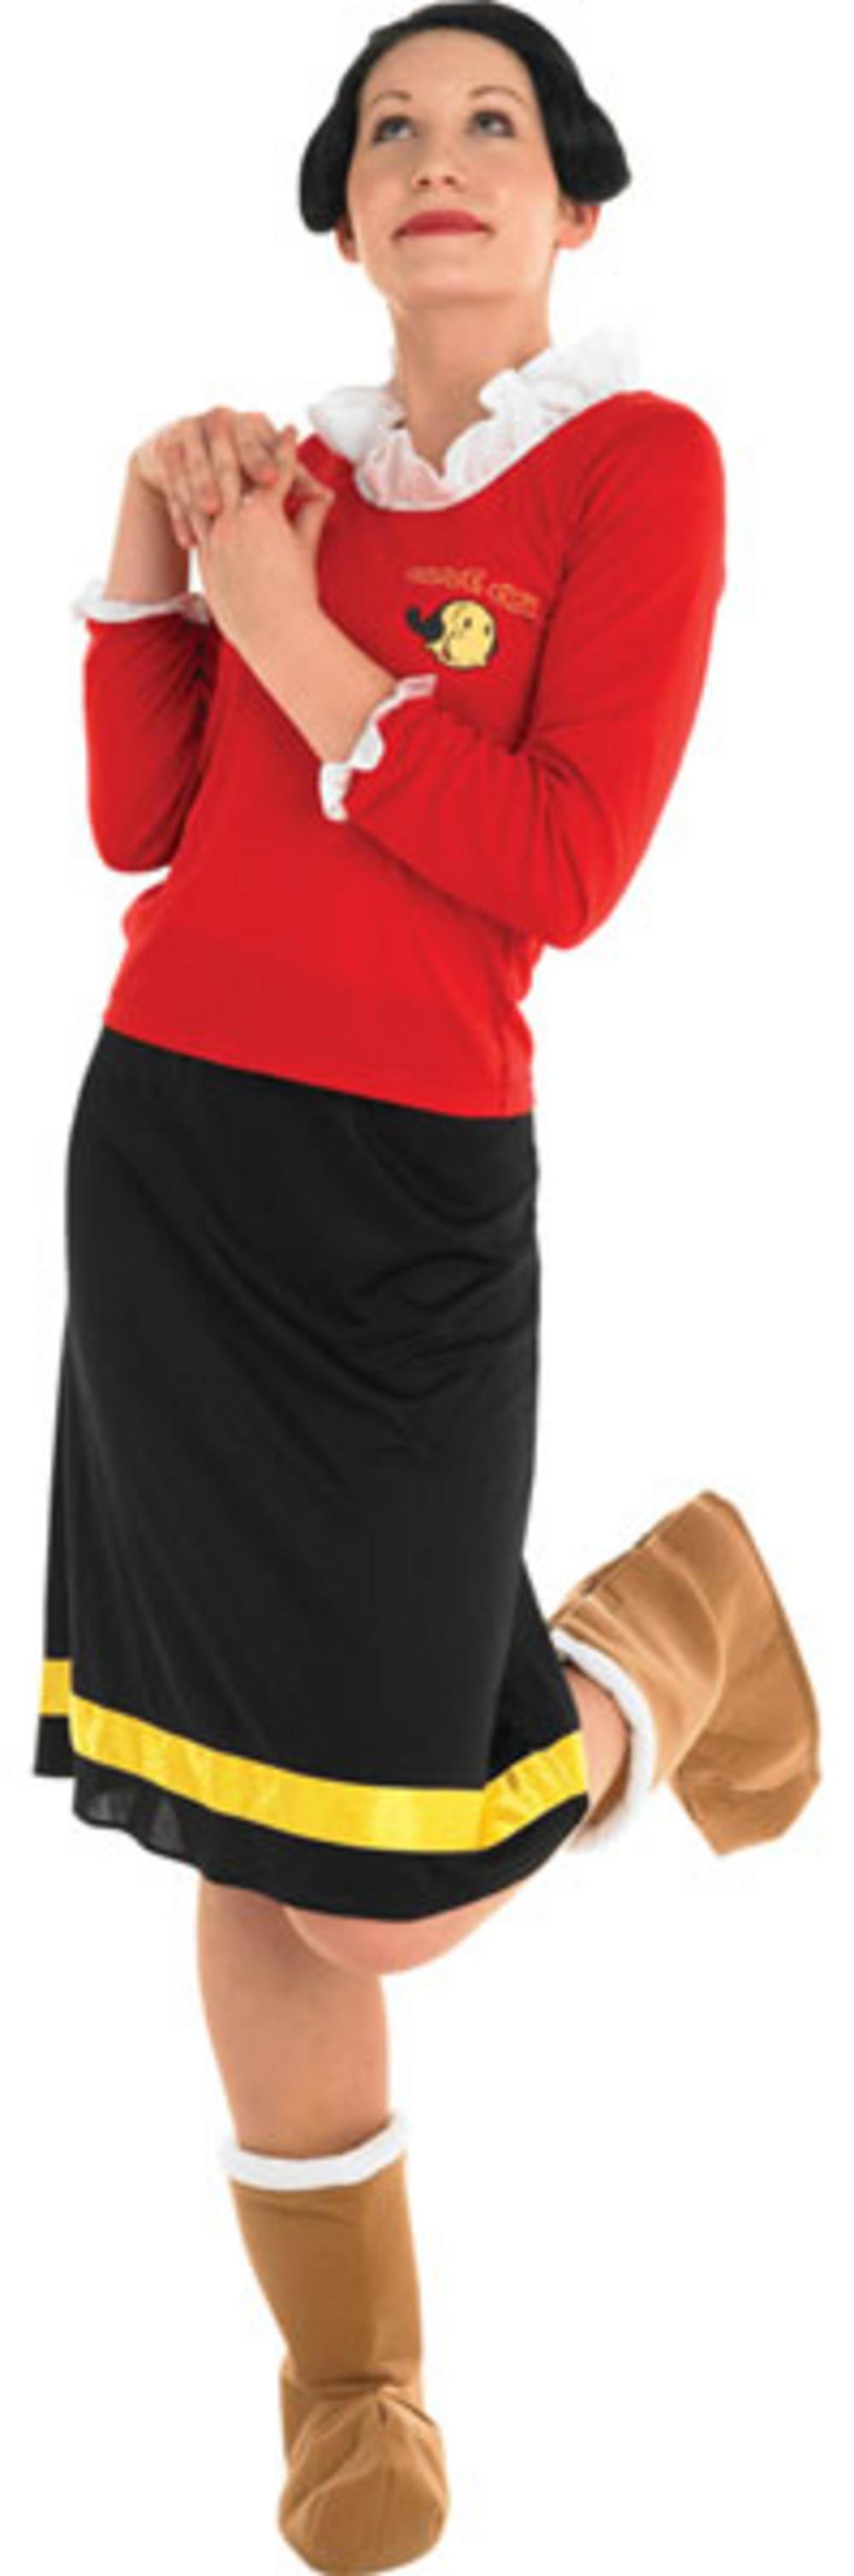 Popeye Olive Oyl Costume